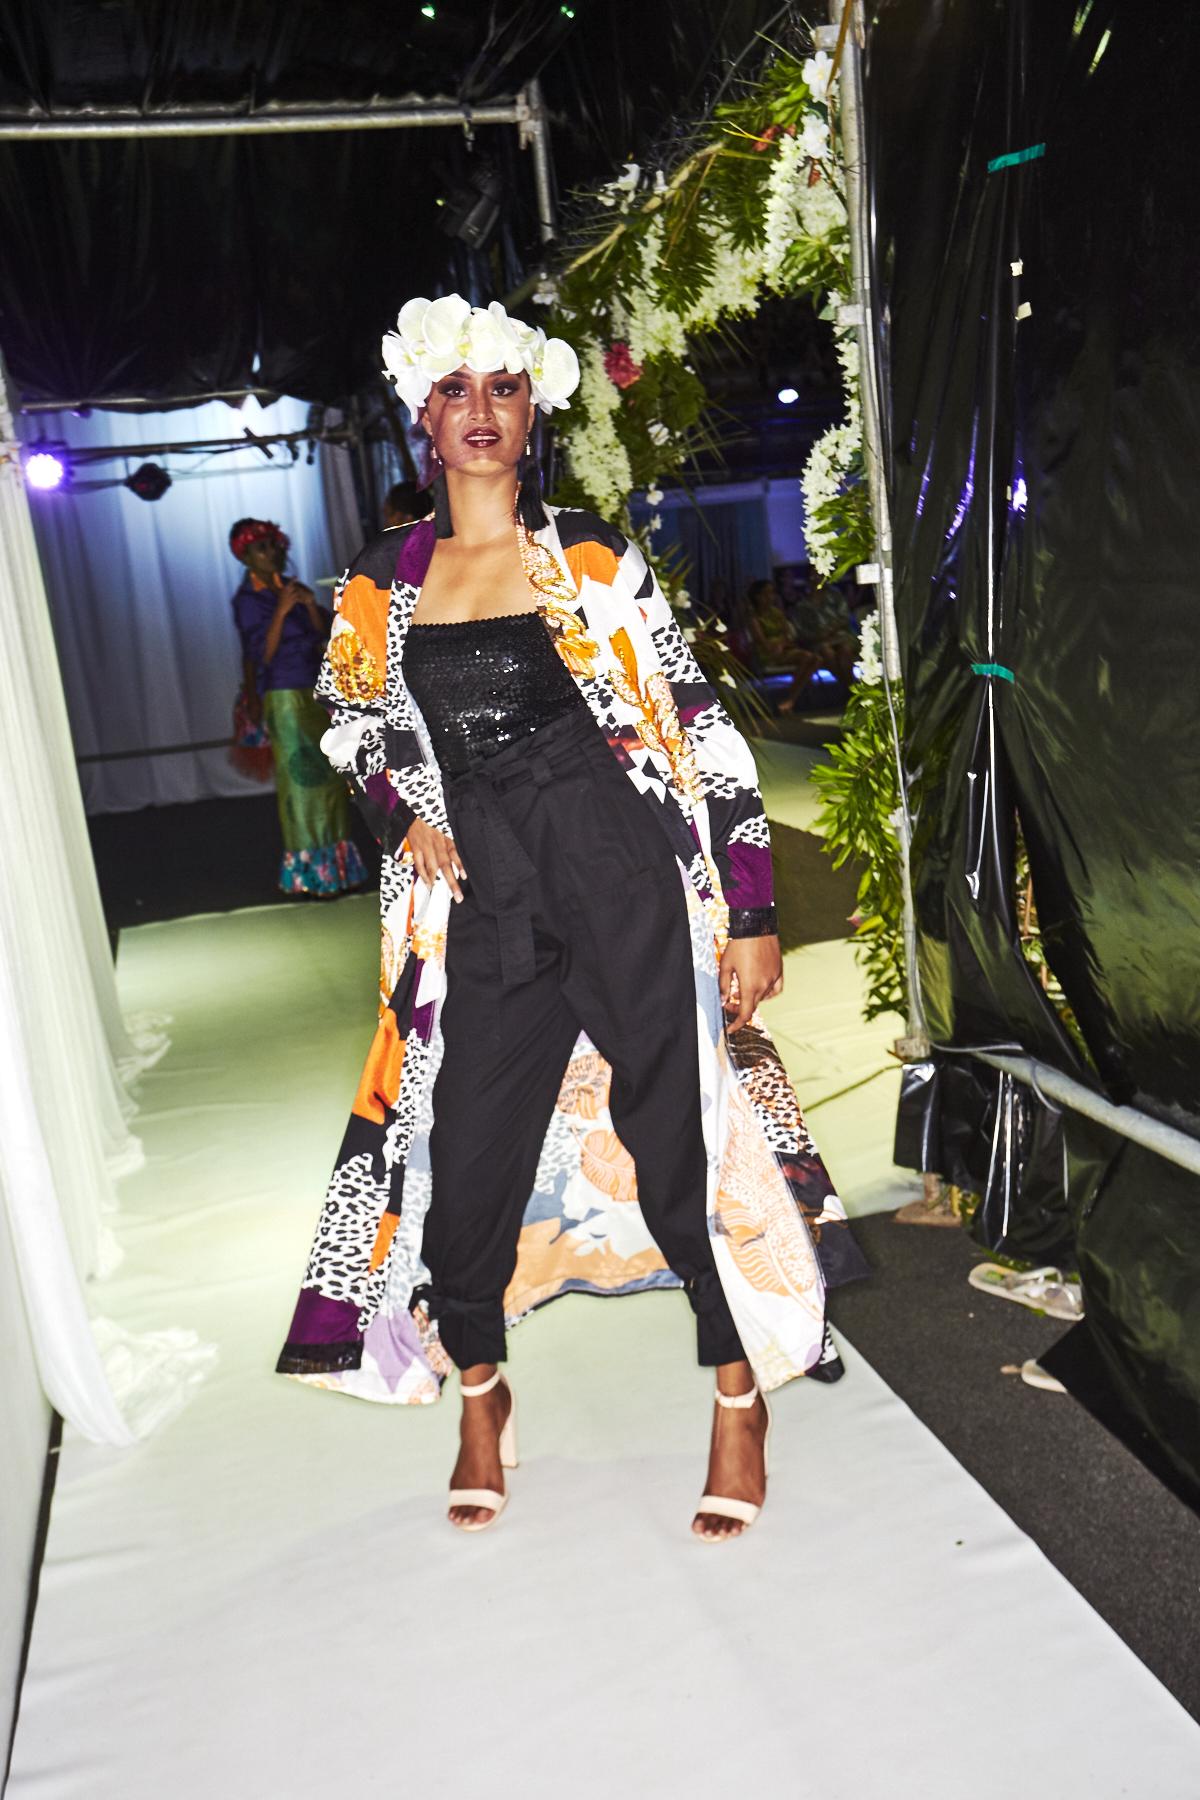 Sonny Vandevelde The Haus Of Koila By Adi Koila Ganilau Lee Resort Luxe 2018 Fashion Show Suva